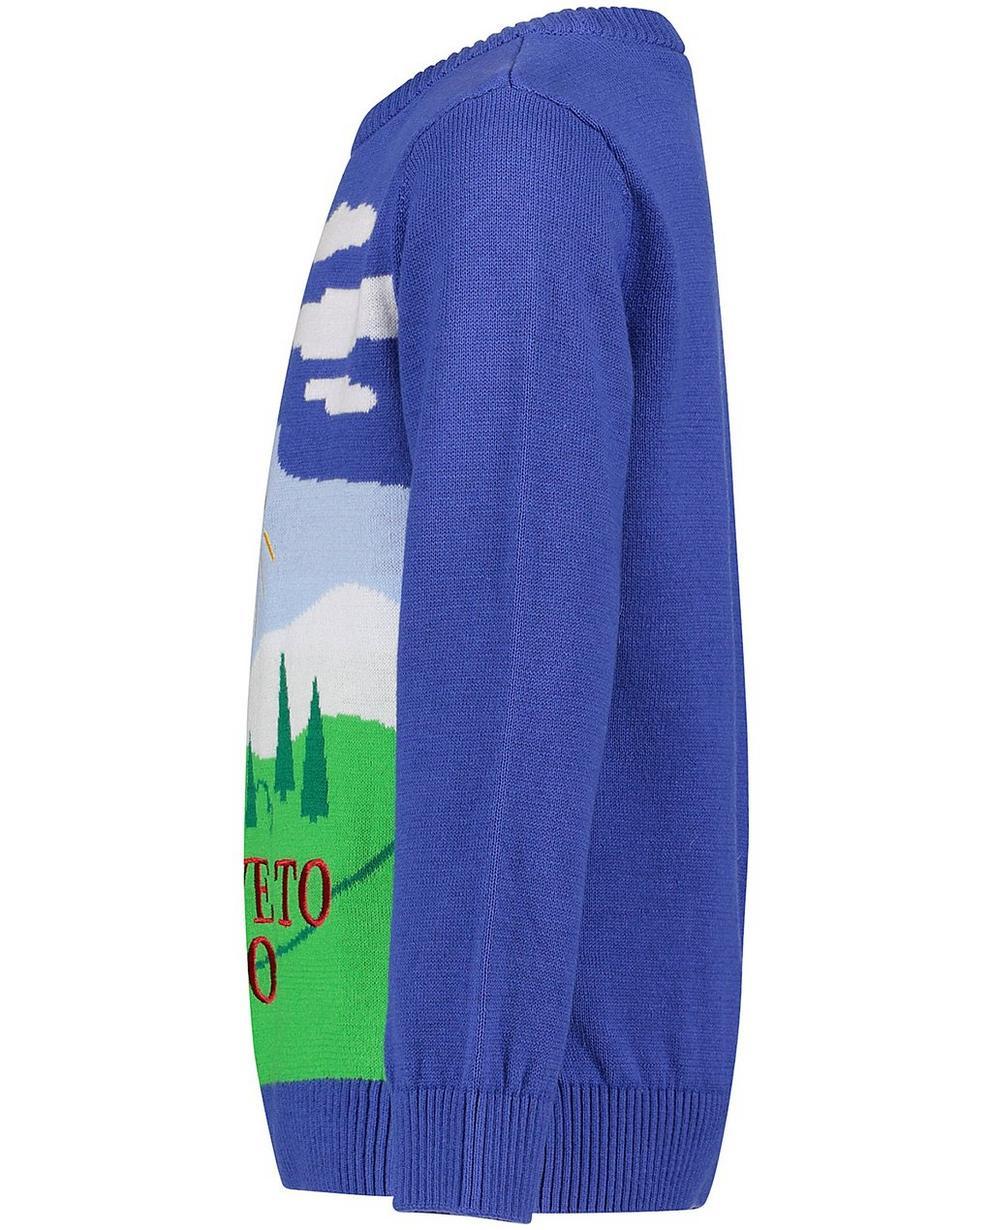 Truien - BLD - Lavendelblauwe trui